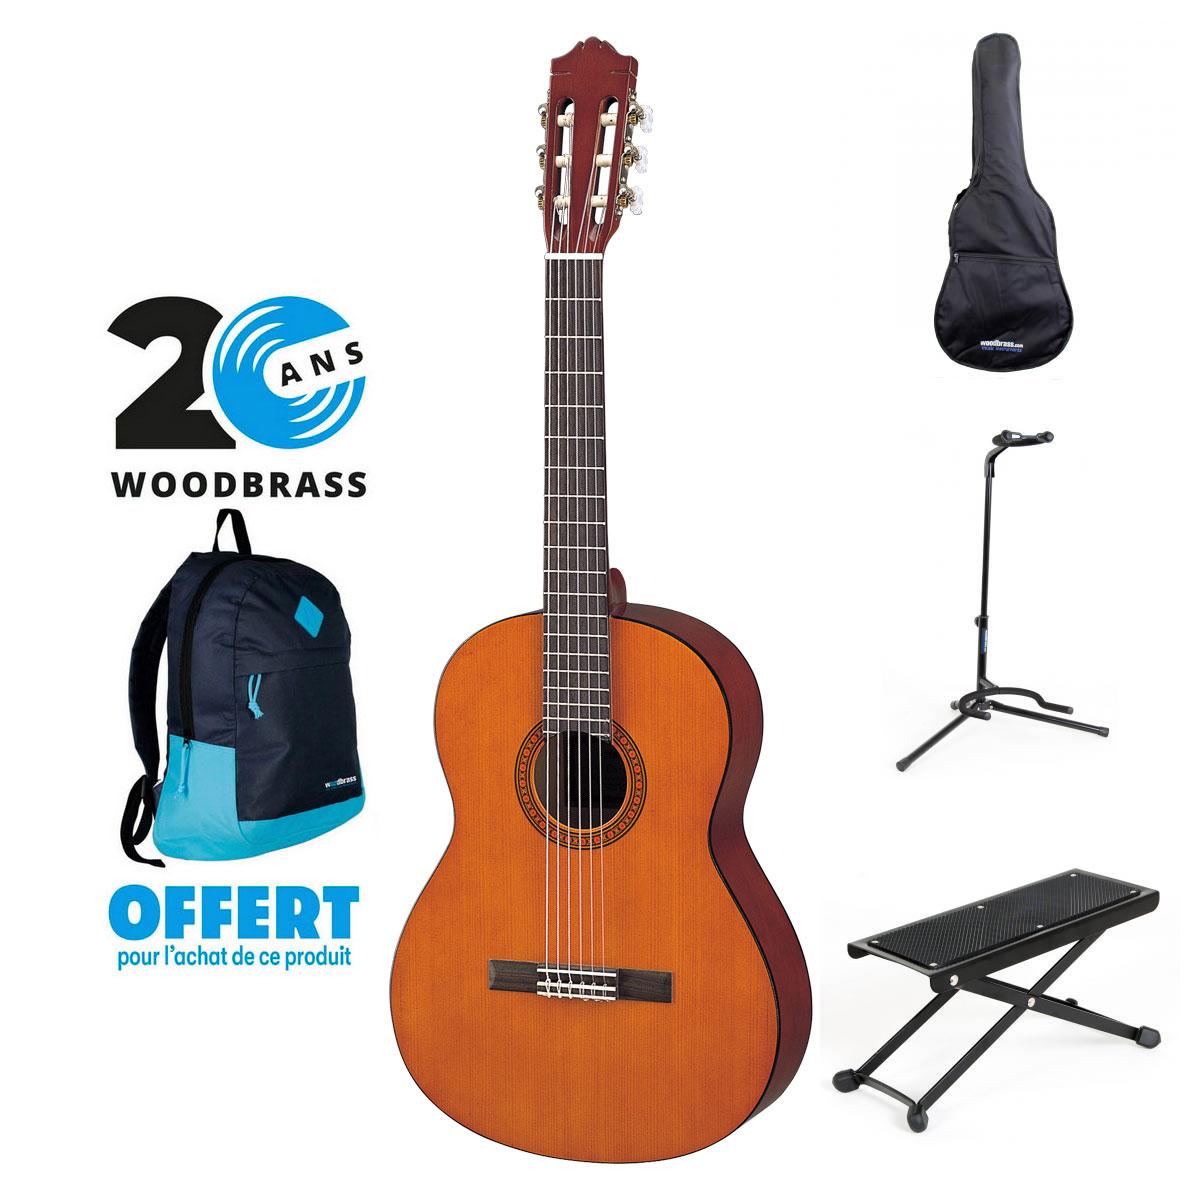 Yamaha Etude Cs40 3/4 - GUITAR - Buy online - Free-scores.com